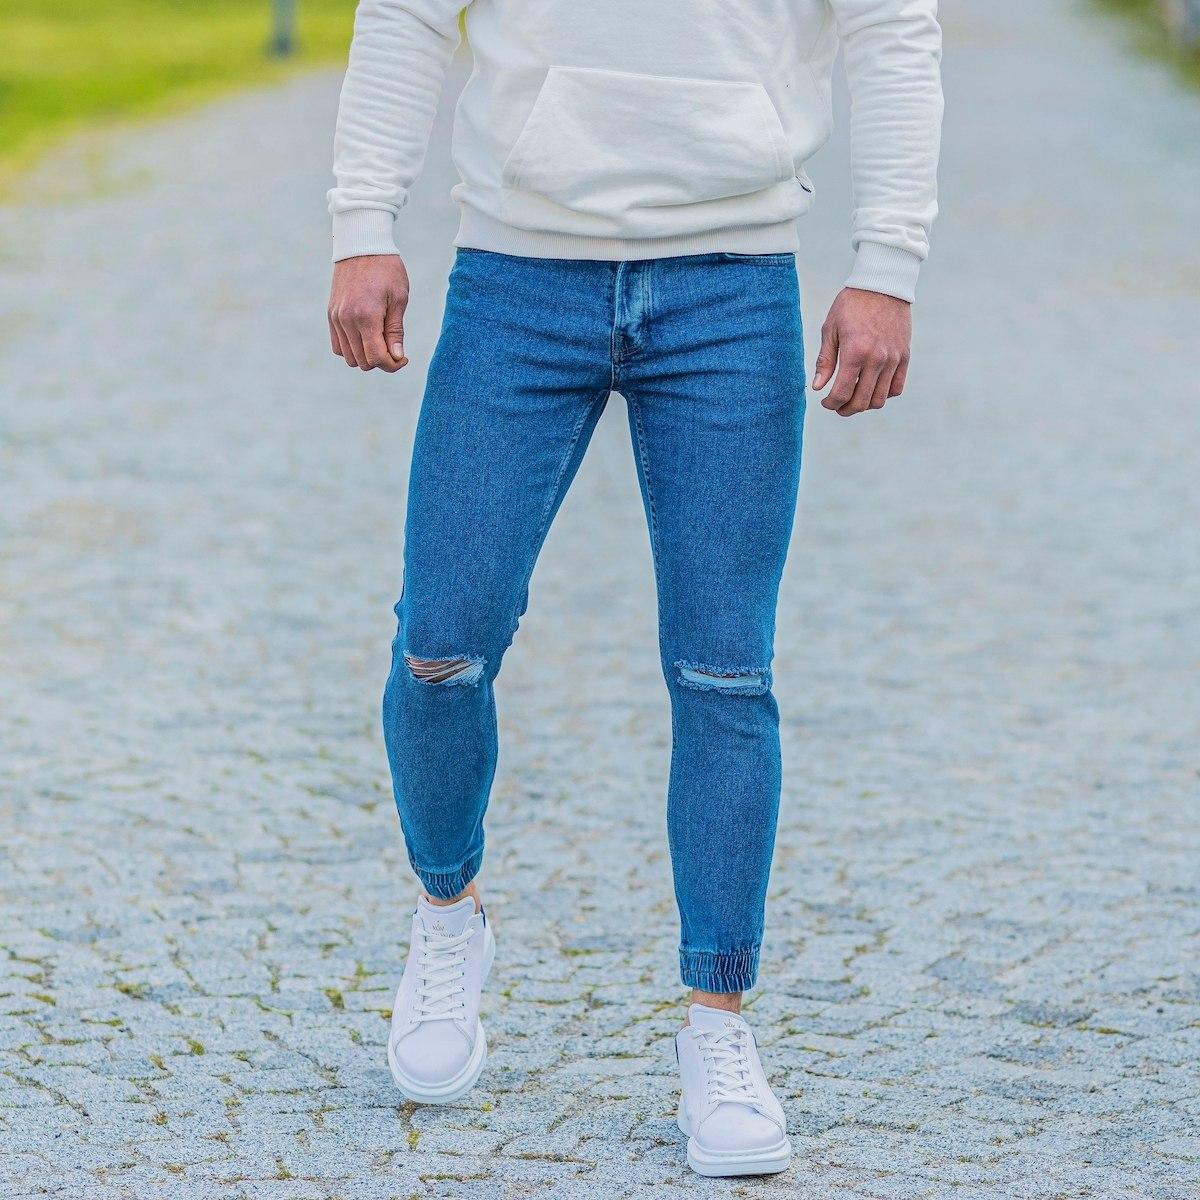 Men's Basic Skinny Distorted Leg Jeans In Ice Blue